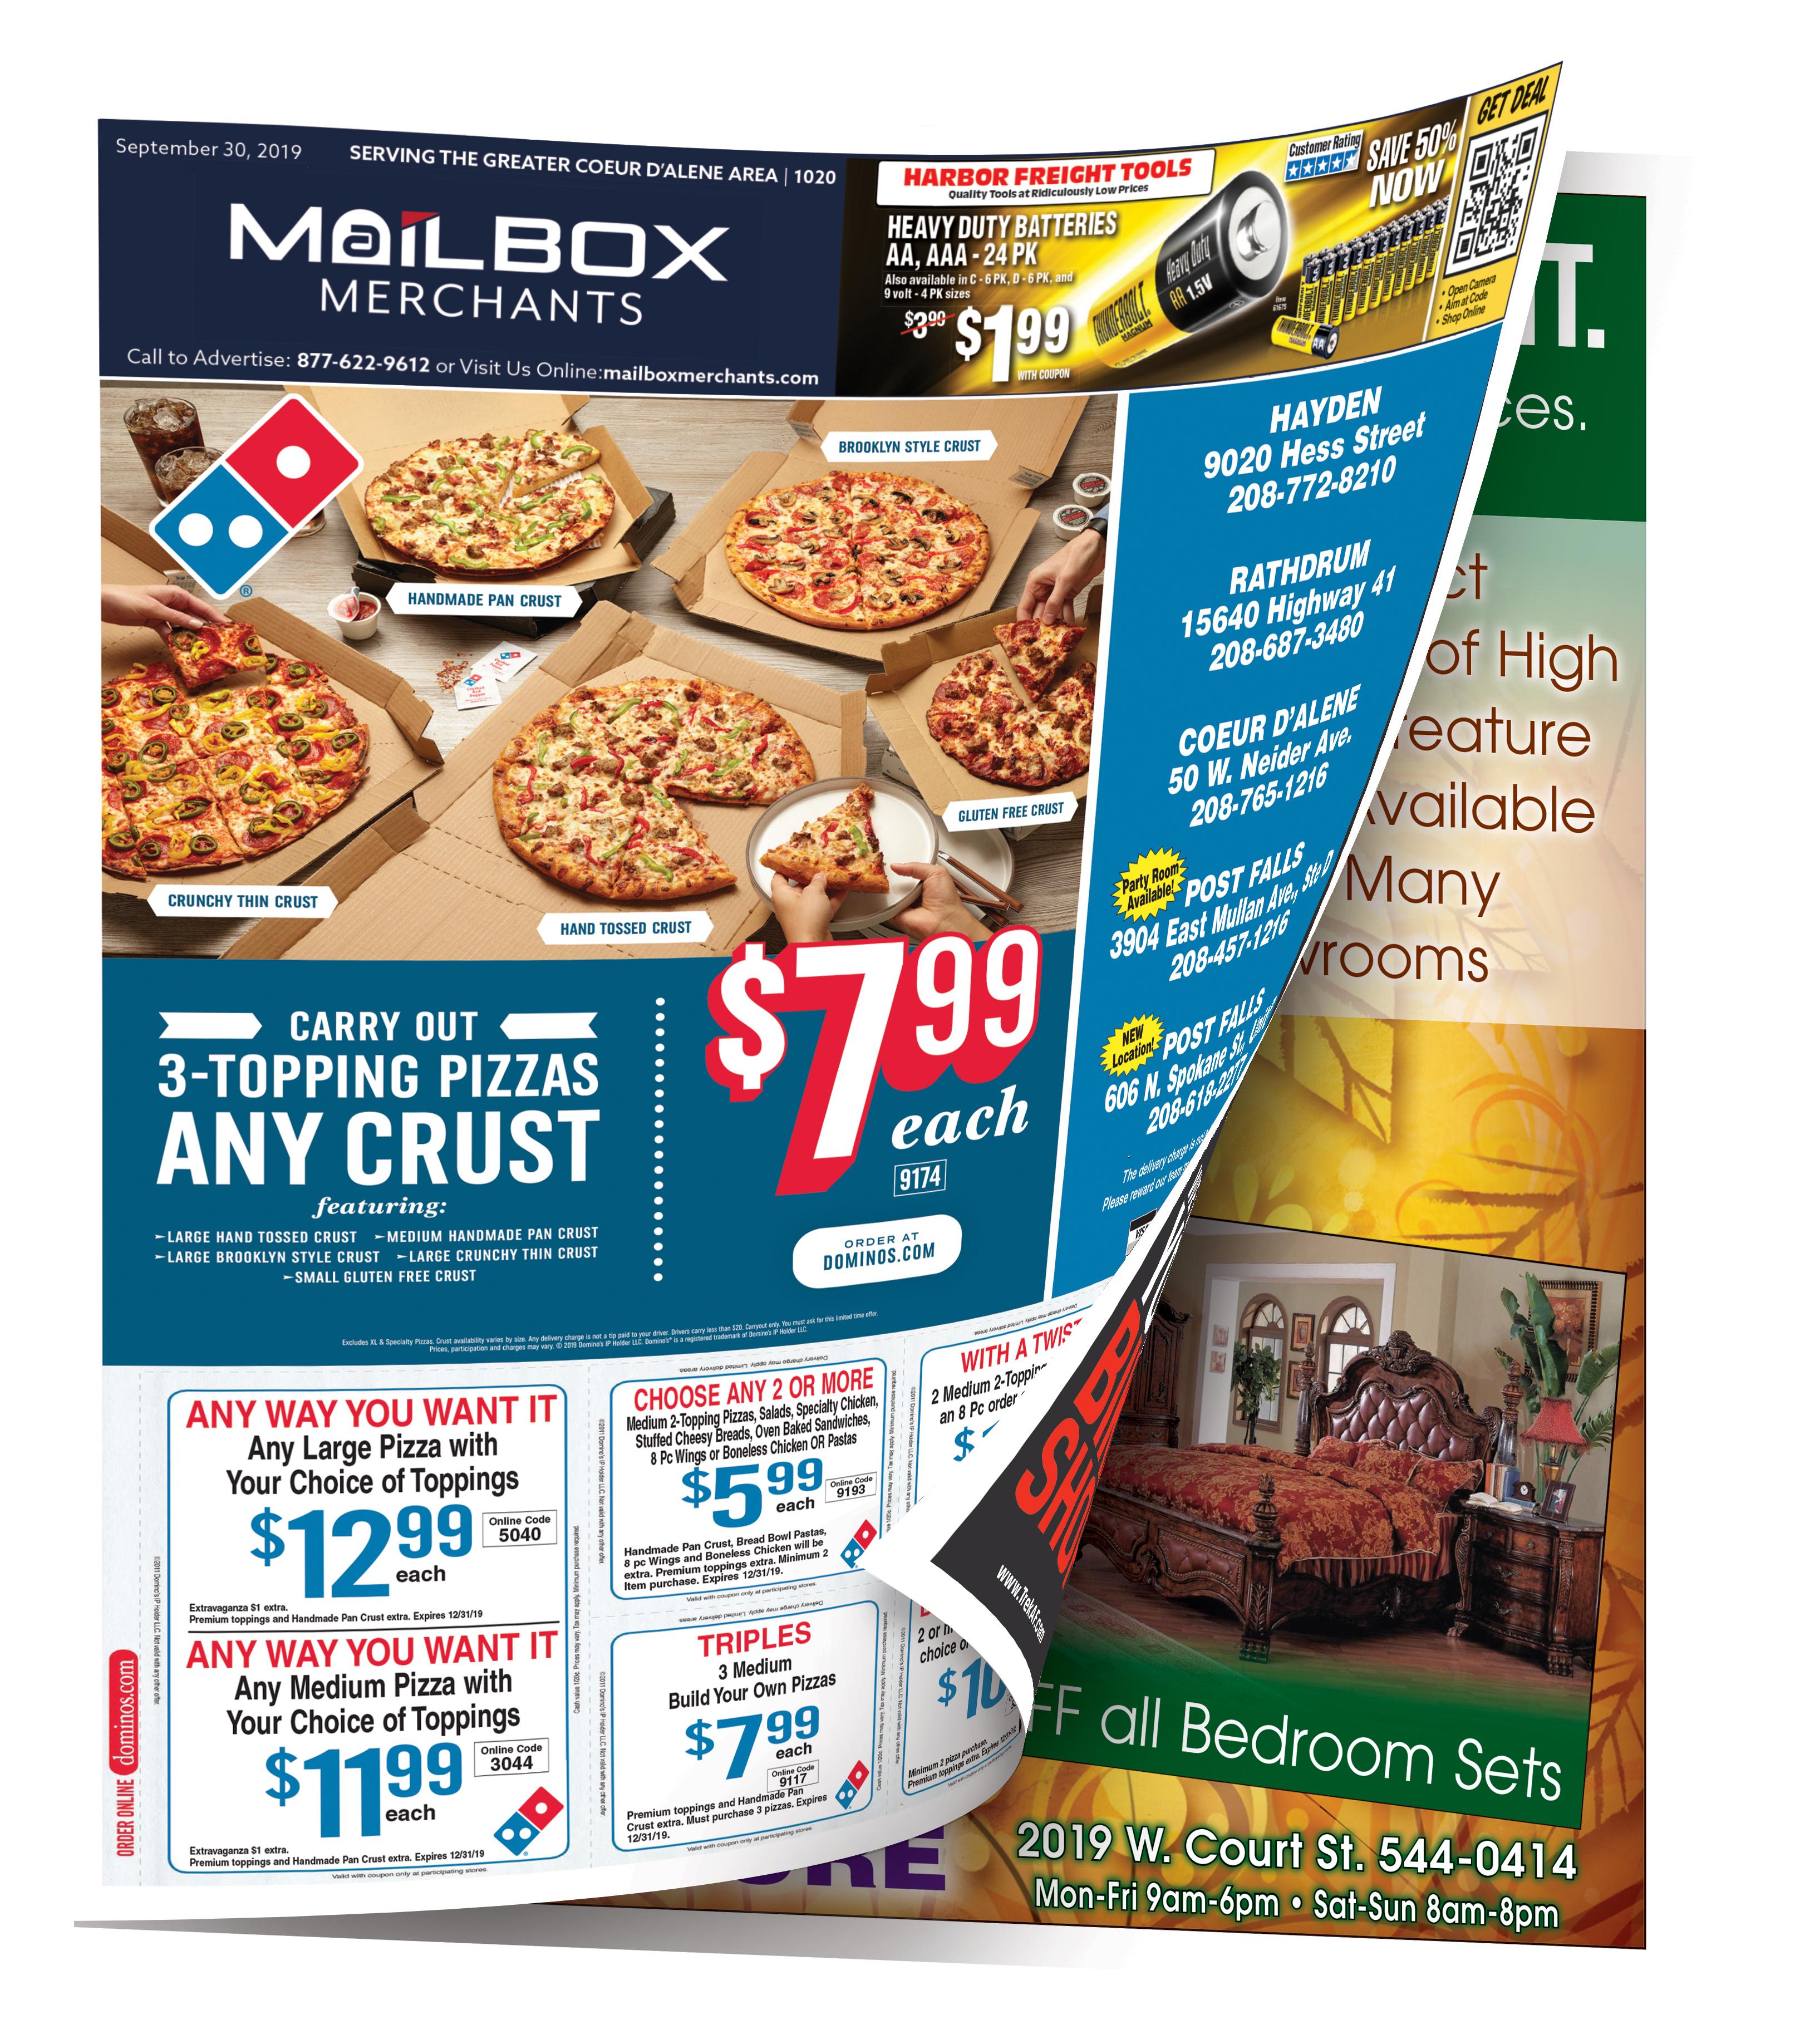 Mailbox Merchants Wrap Example